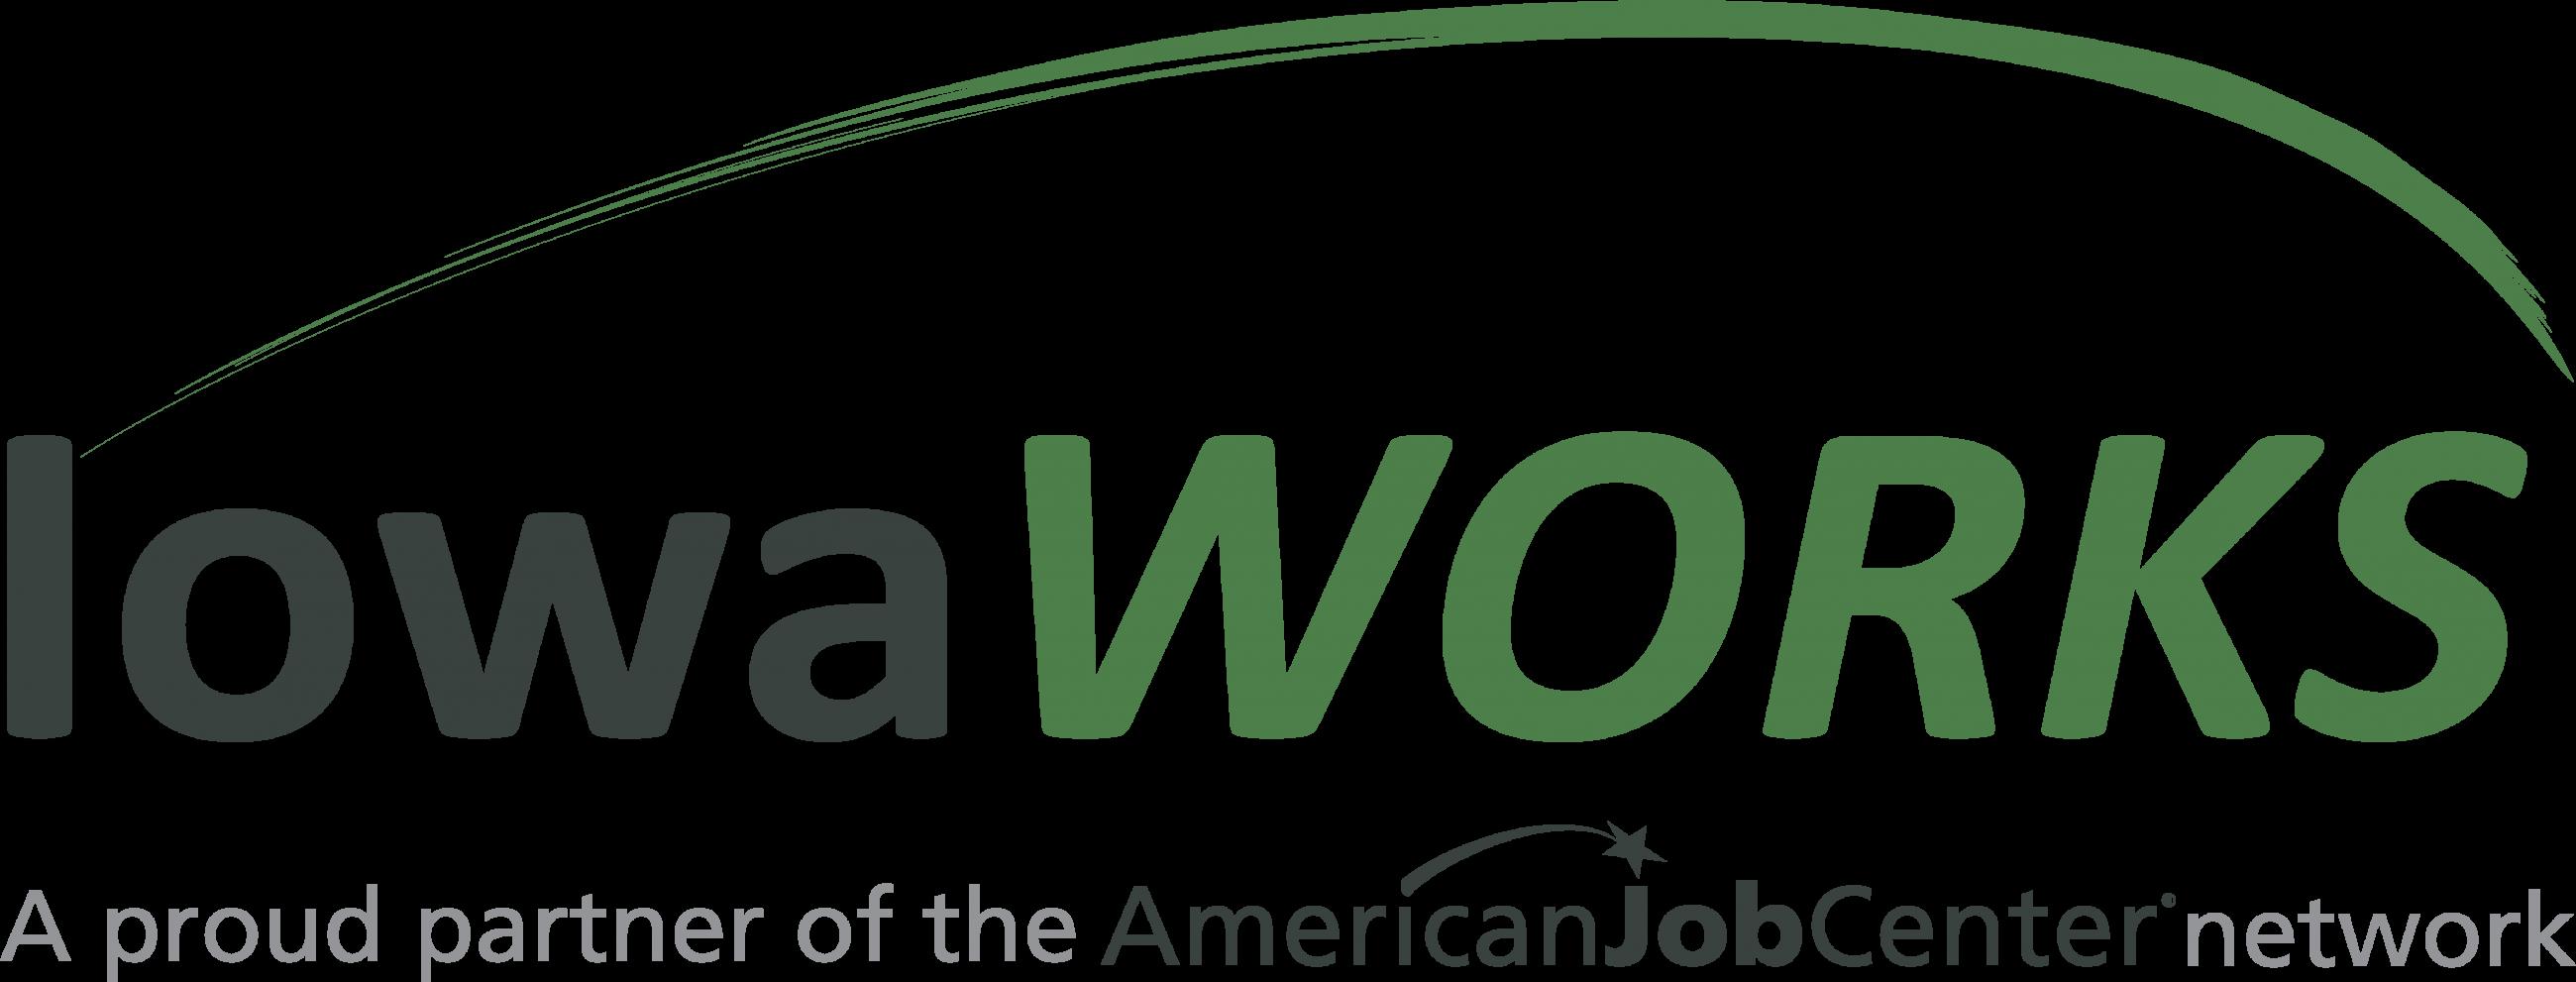 IowaWORKS programs help individuals gain workplace skills  Main Photo